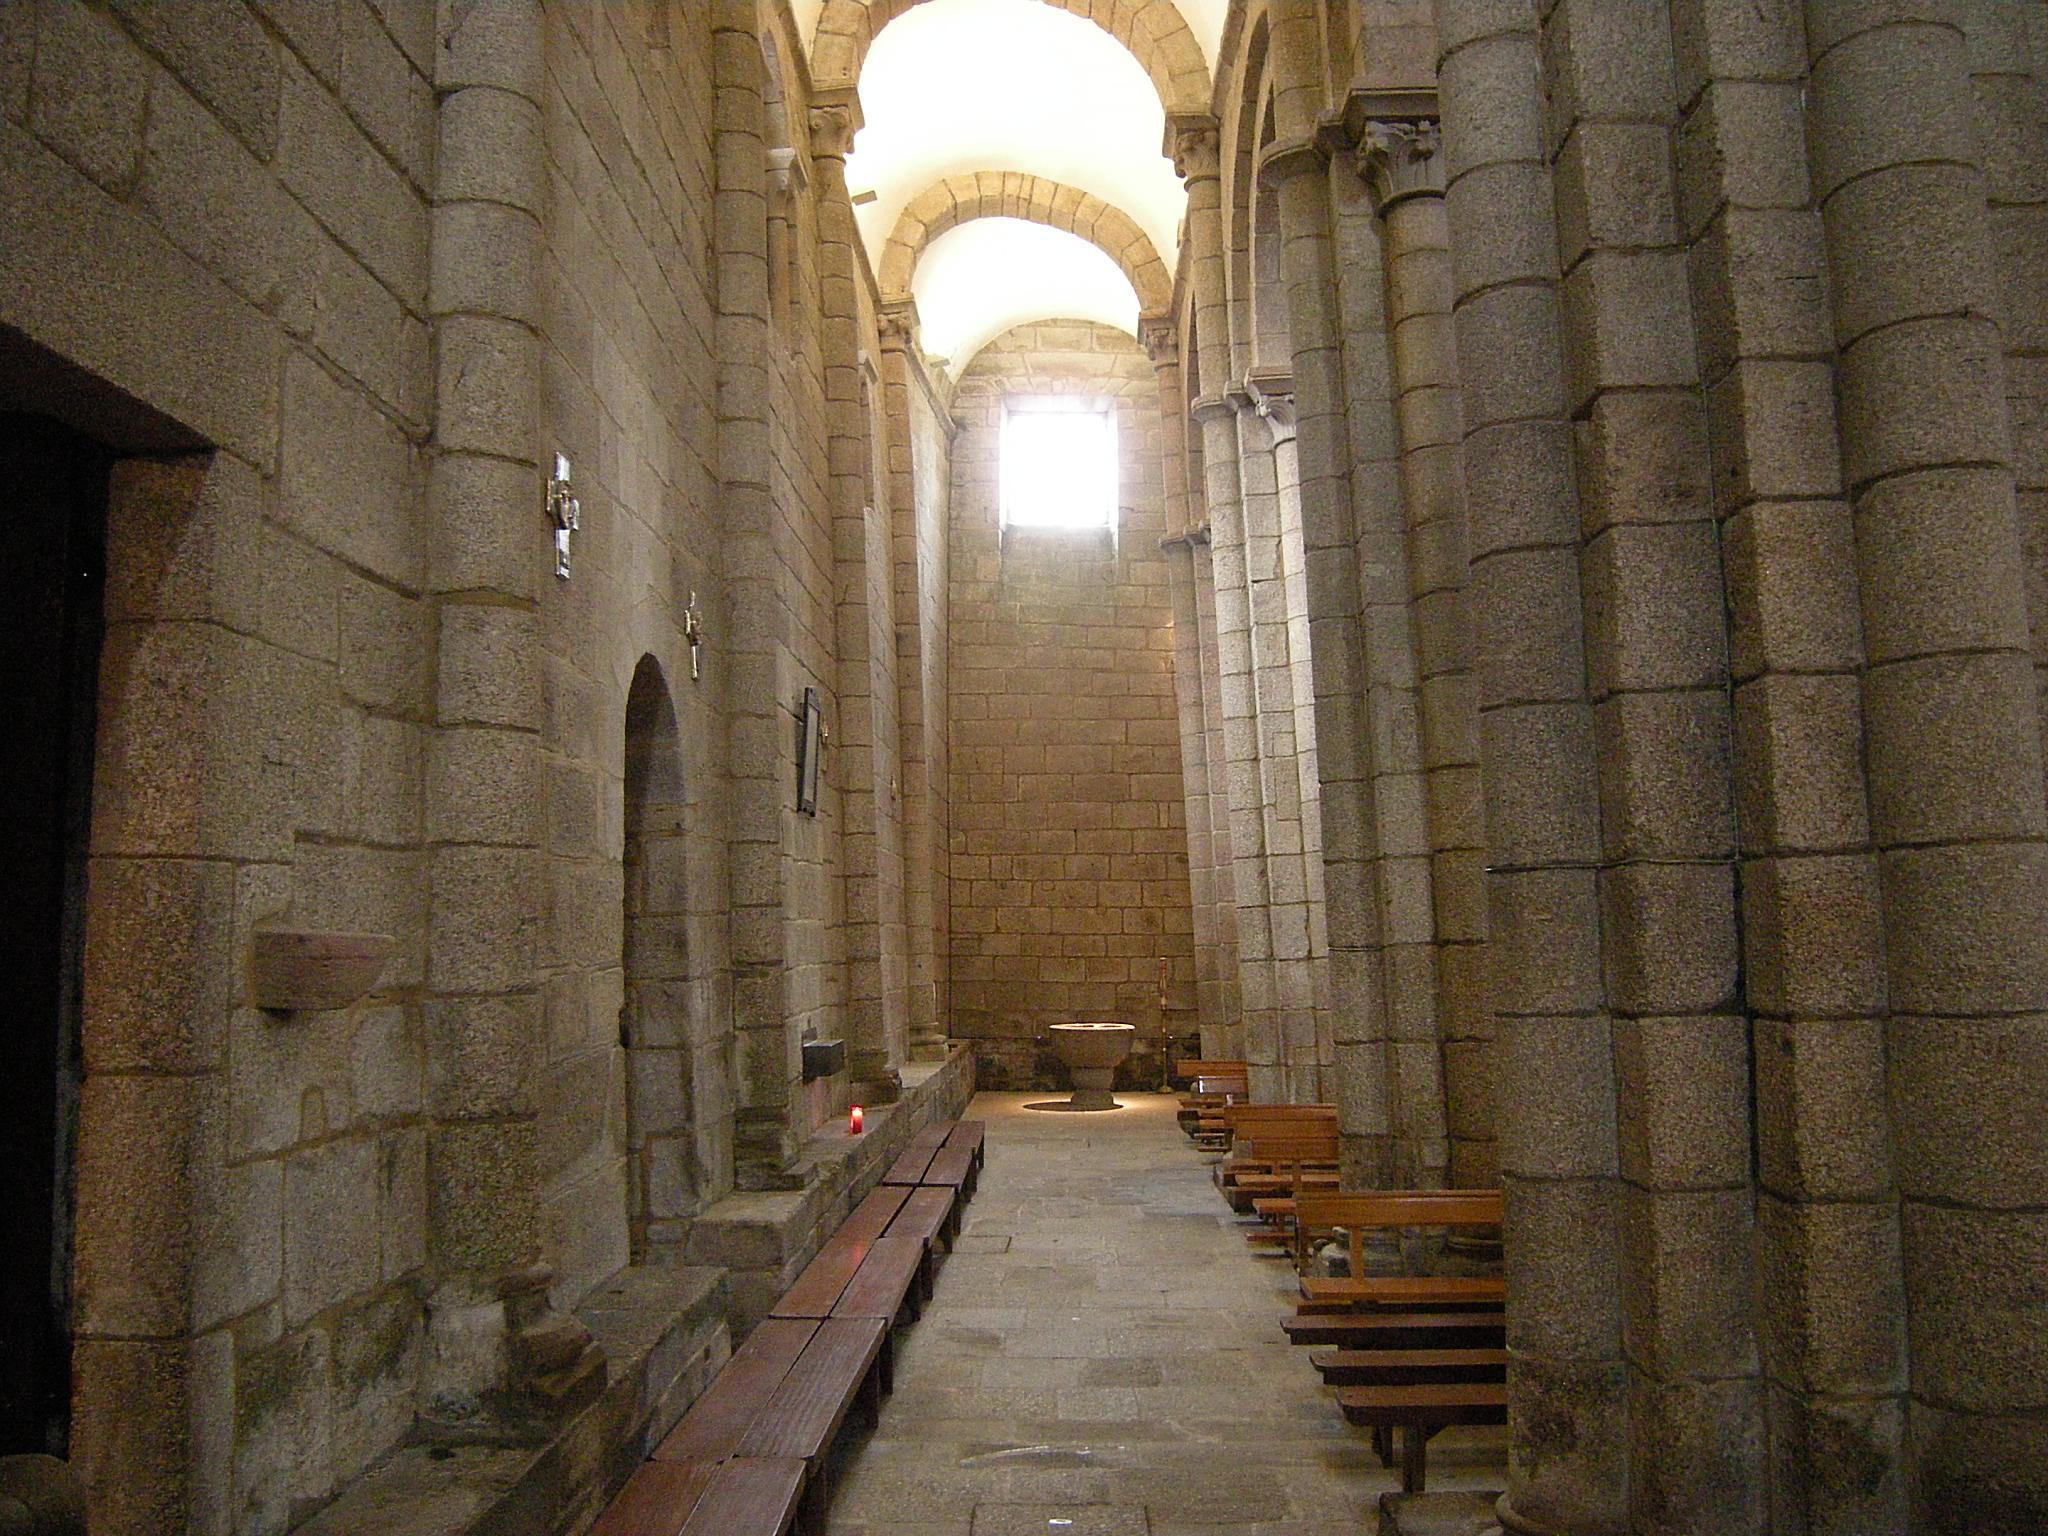 File:Colegiata de Santa Maria de Sar 5.jpg - Wikimedia Commons